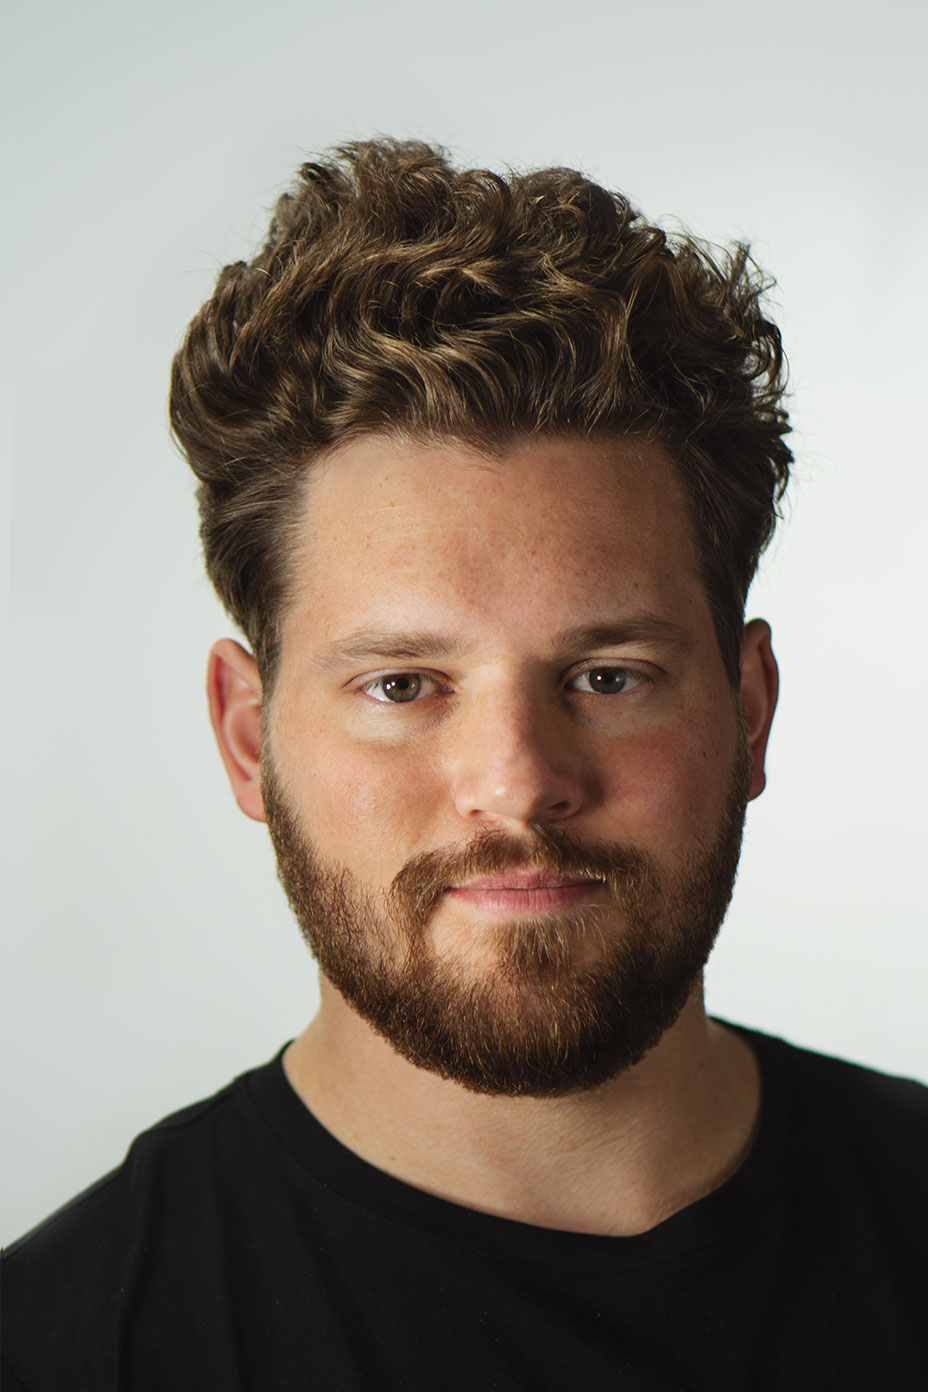 Portrait of Mark Lupul, the Digital Director of Blodwen Audrey.